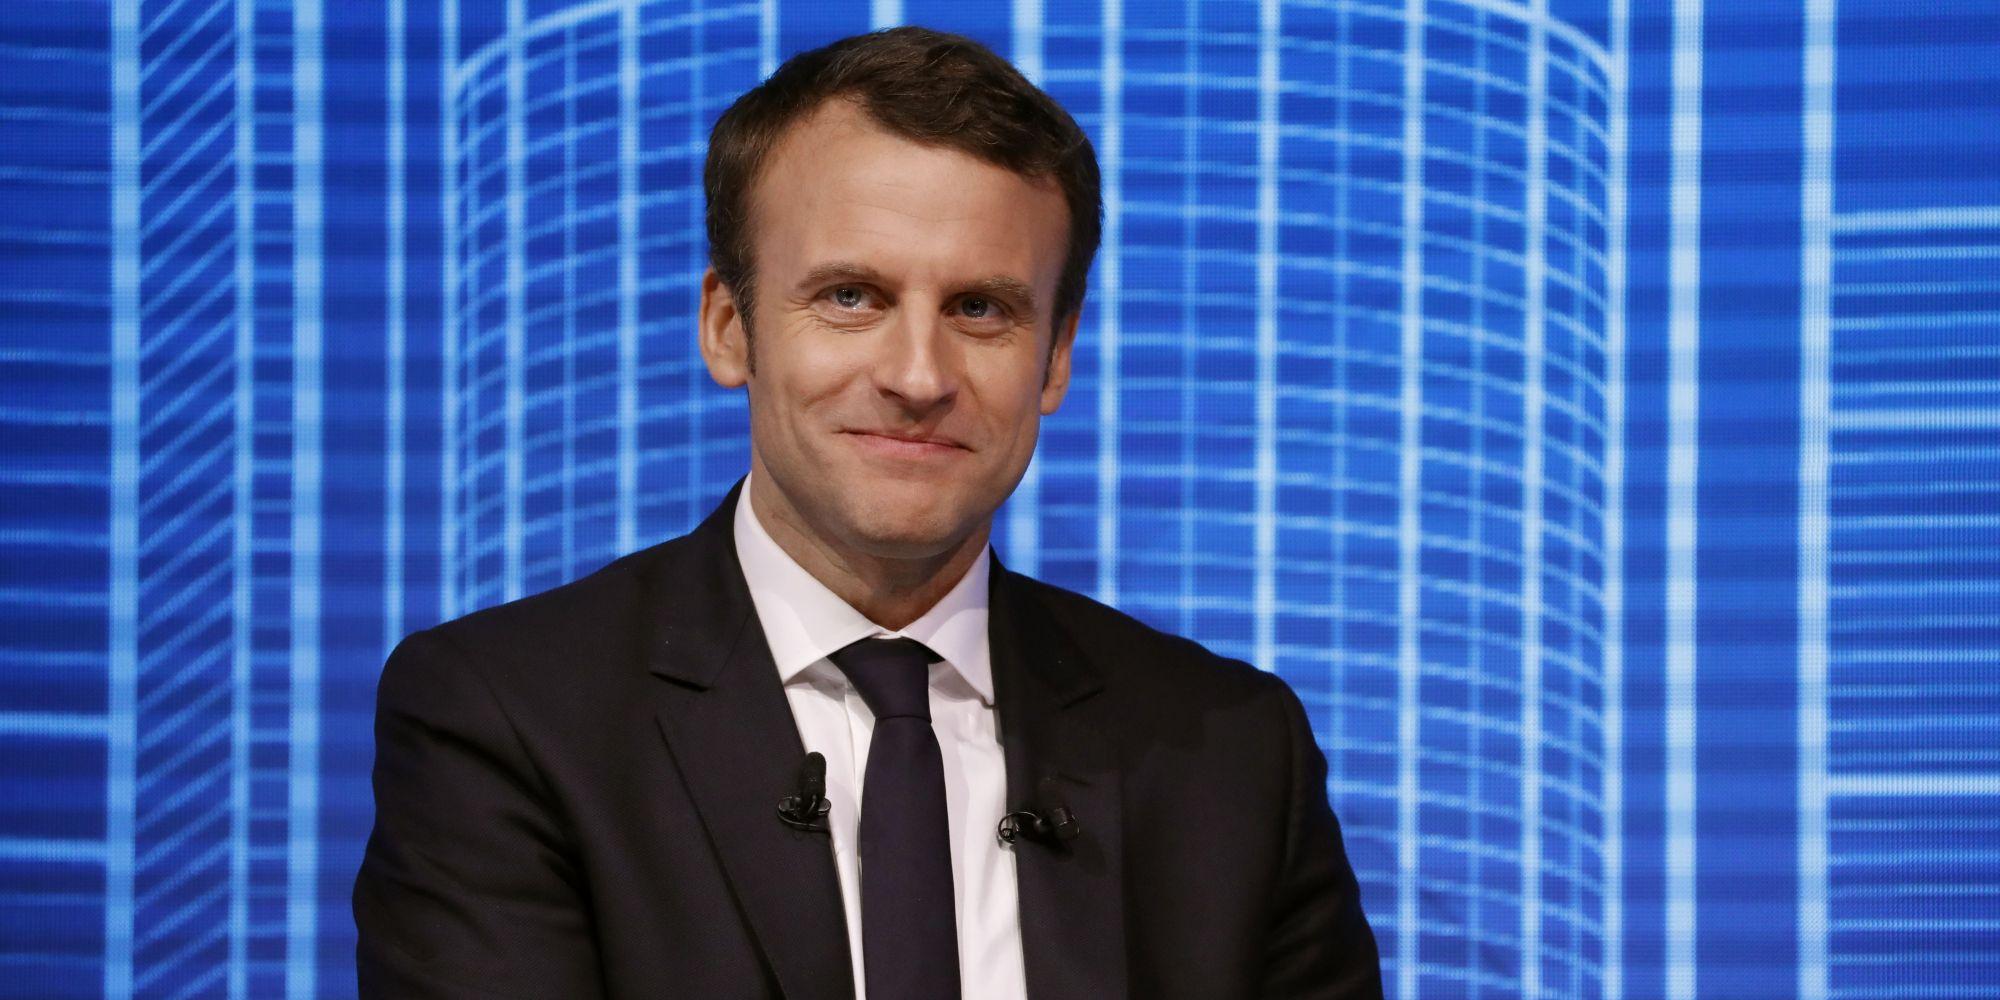 Europe's Man Of The Moment, Emmanuel Macron | HuffPost UK Emmanuel Macron